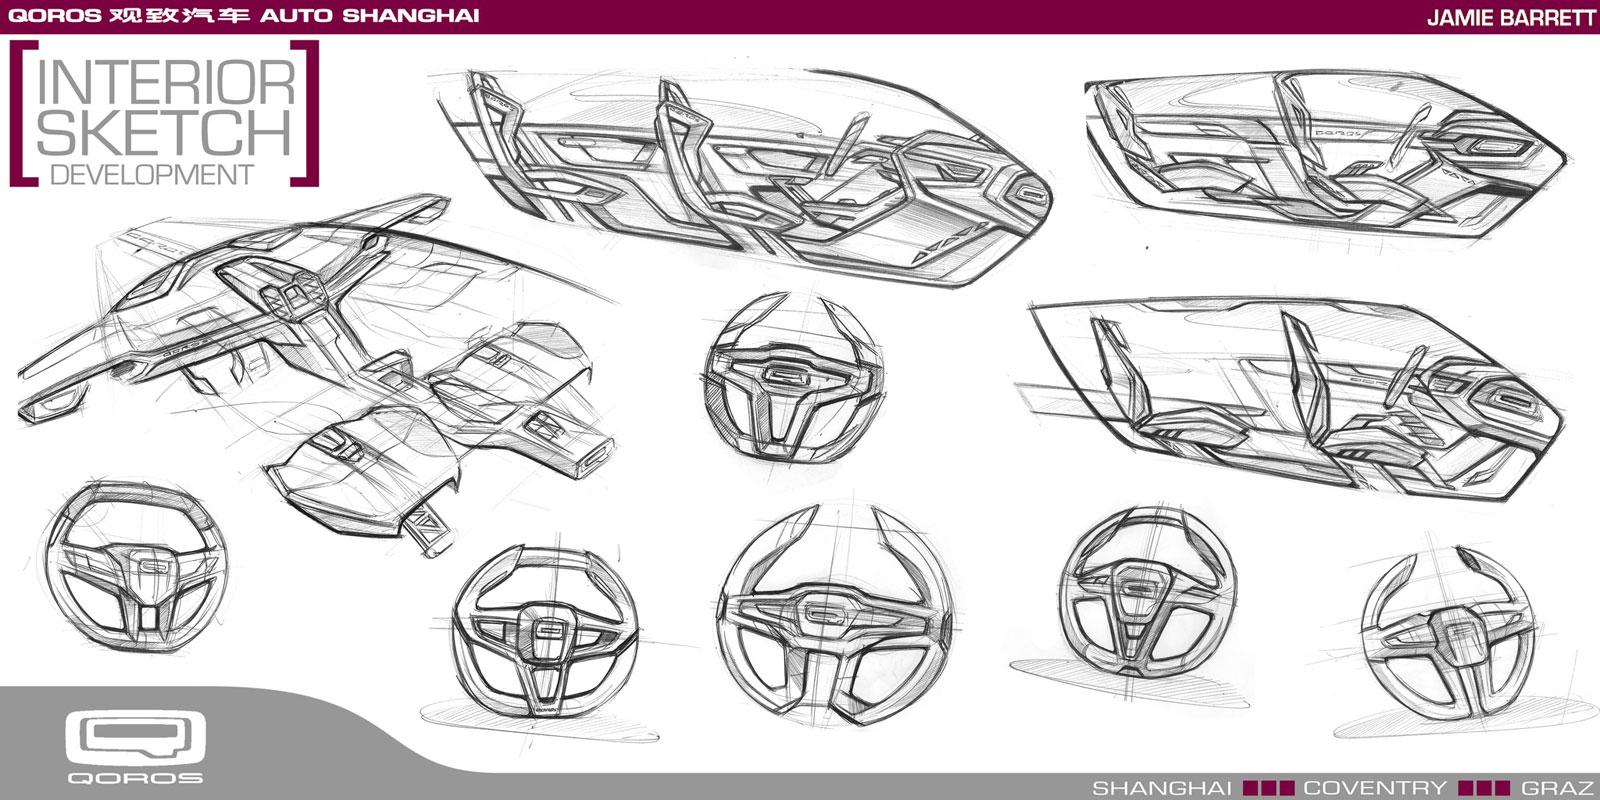 Qoros Flagship Concept Interior Development Design